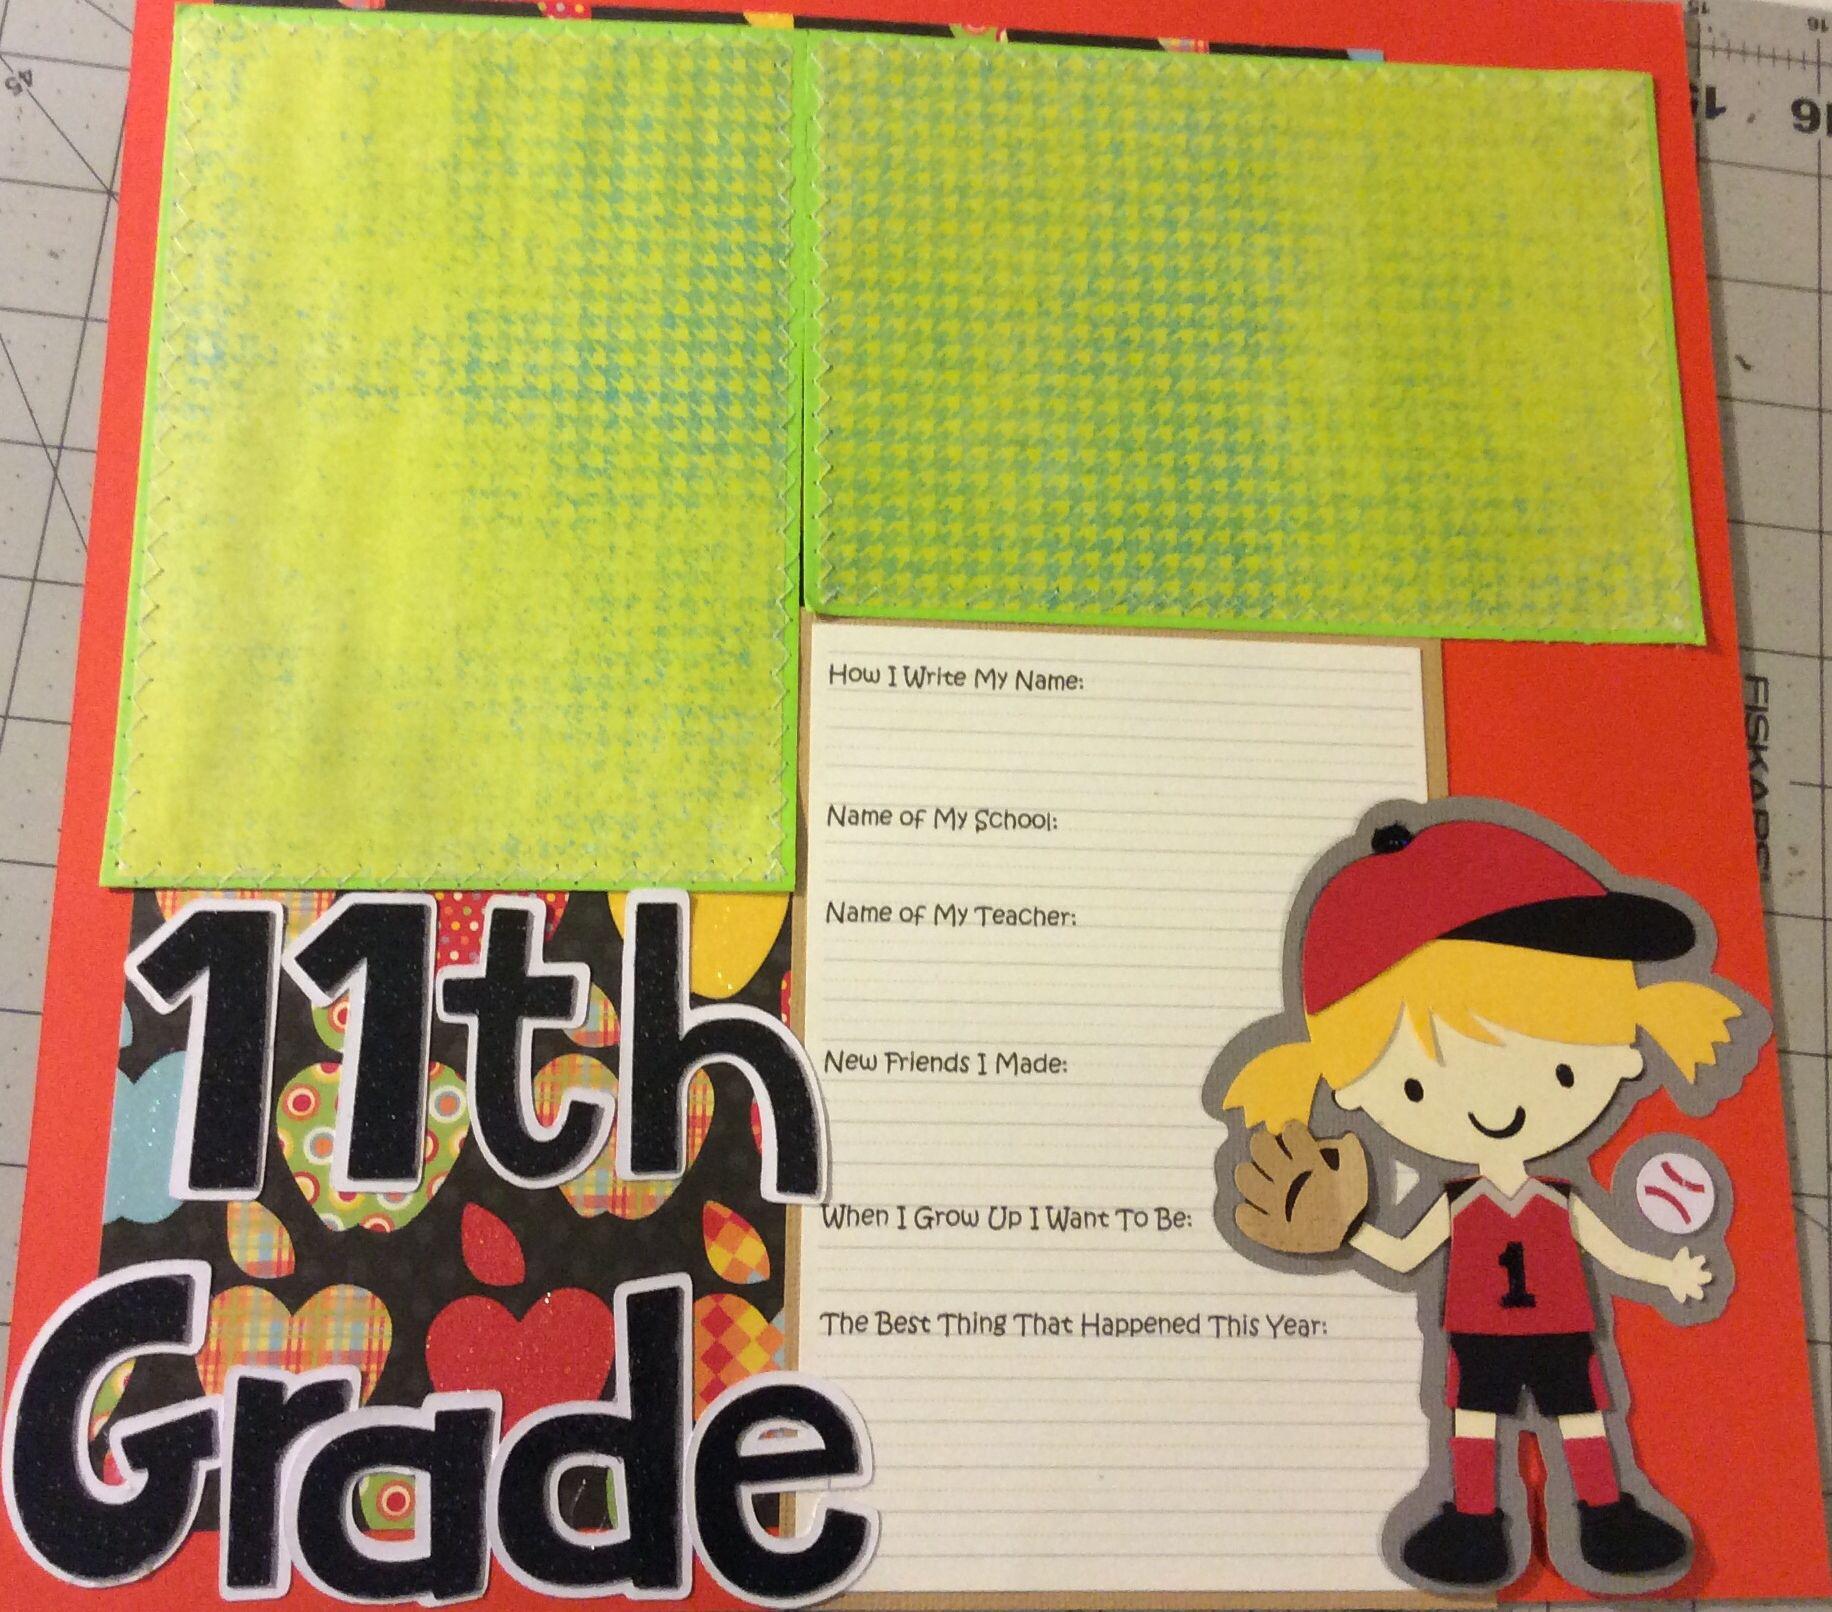 Scrapbook ideas using cricut - First Day Last Day School Scrapbook Album For Little Girl Using Cricut Cartridge Create A Friend